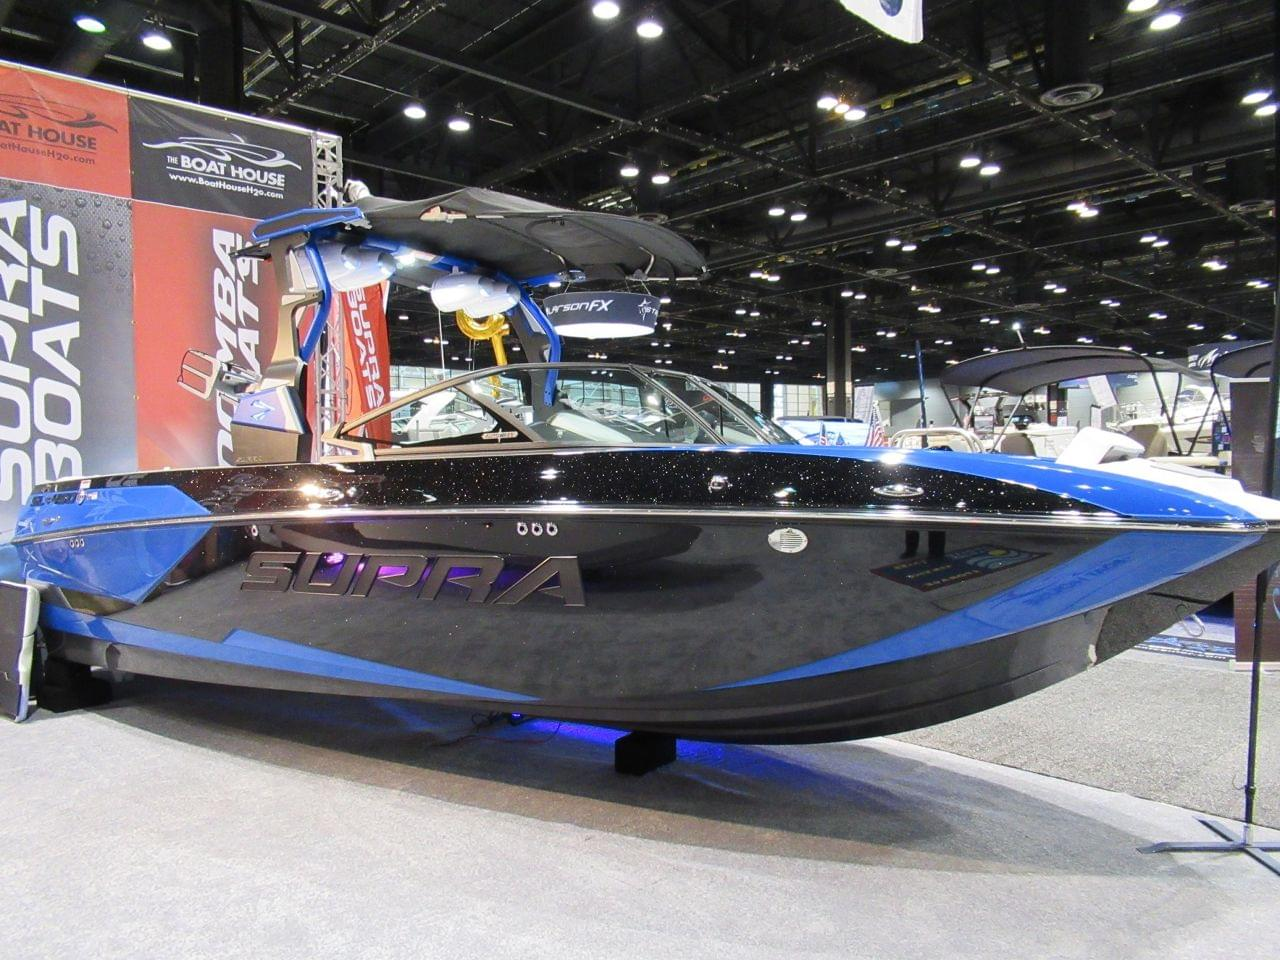 Supra SL450